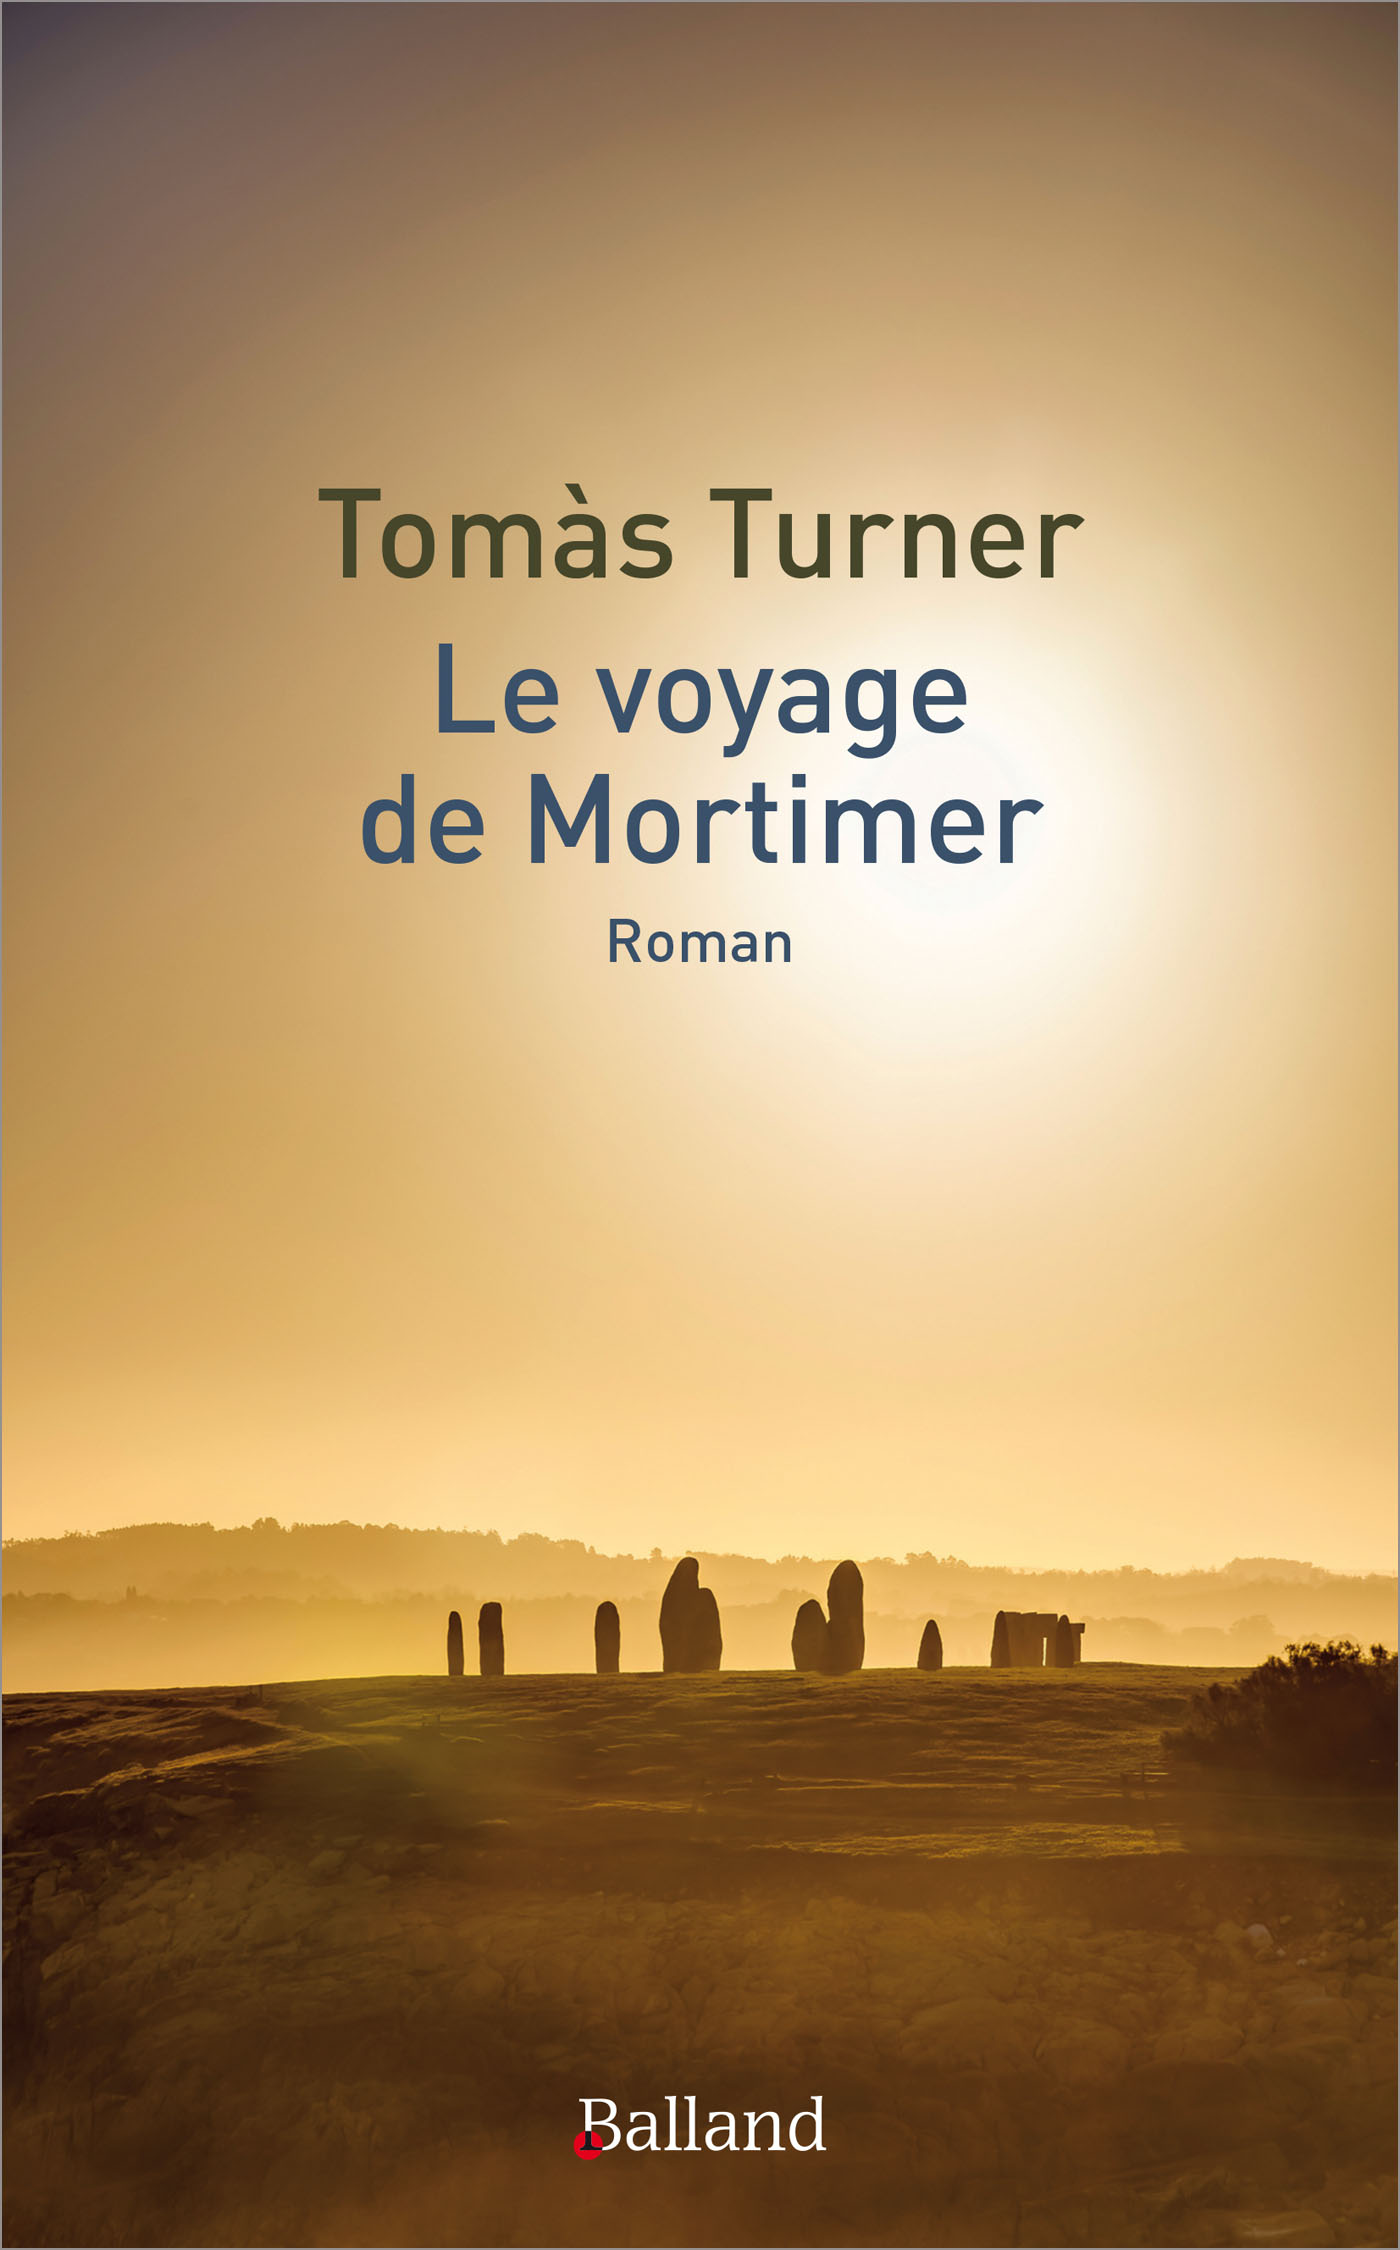 Le voyage de Mortimer